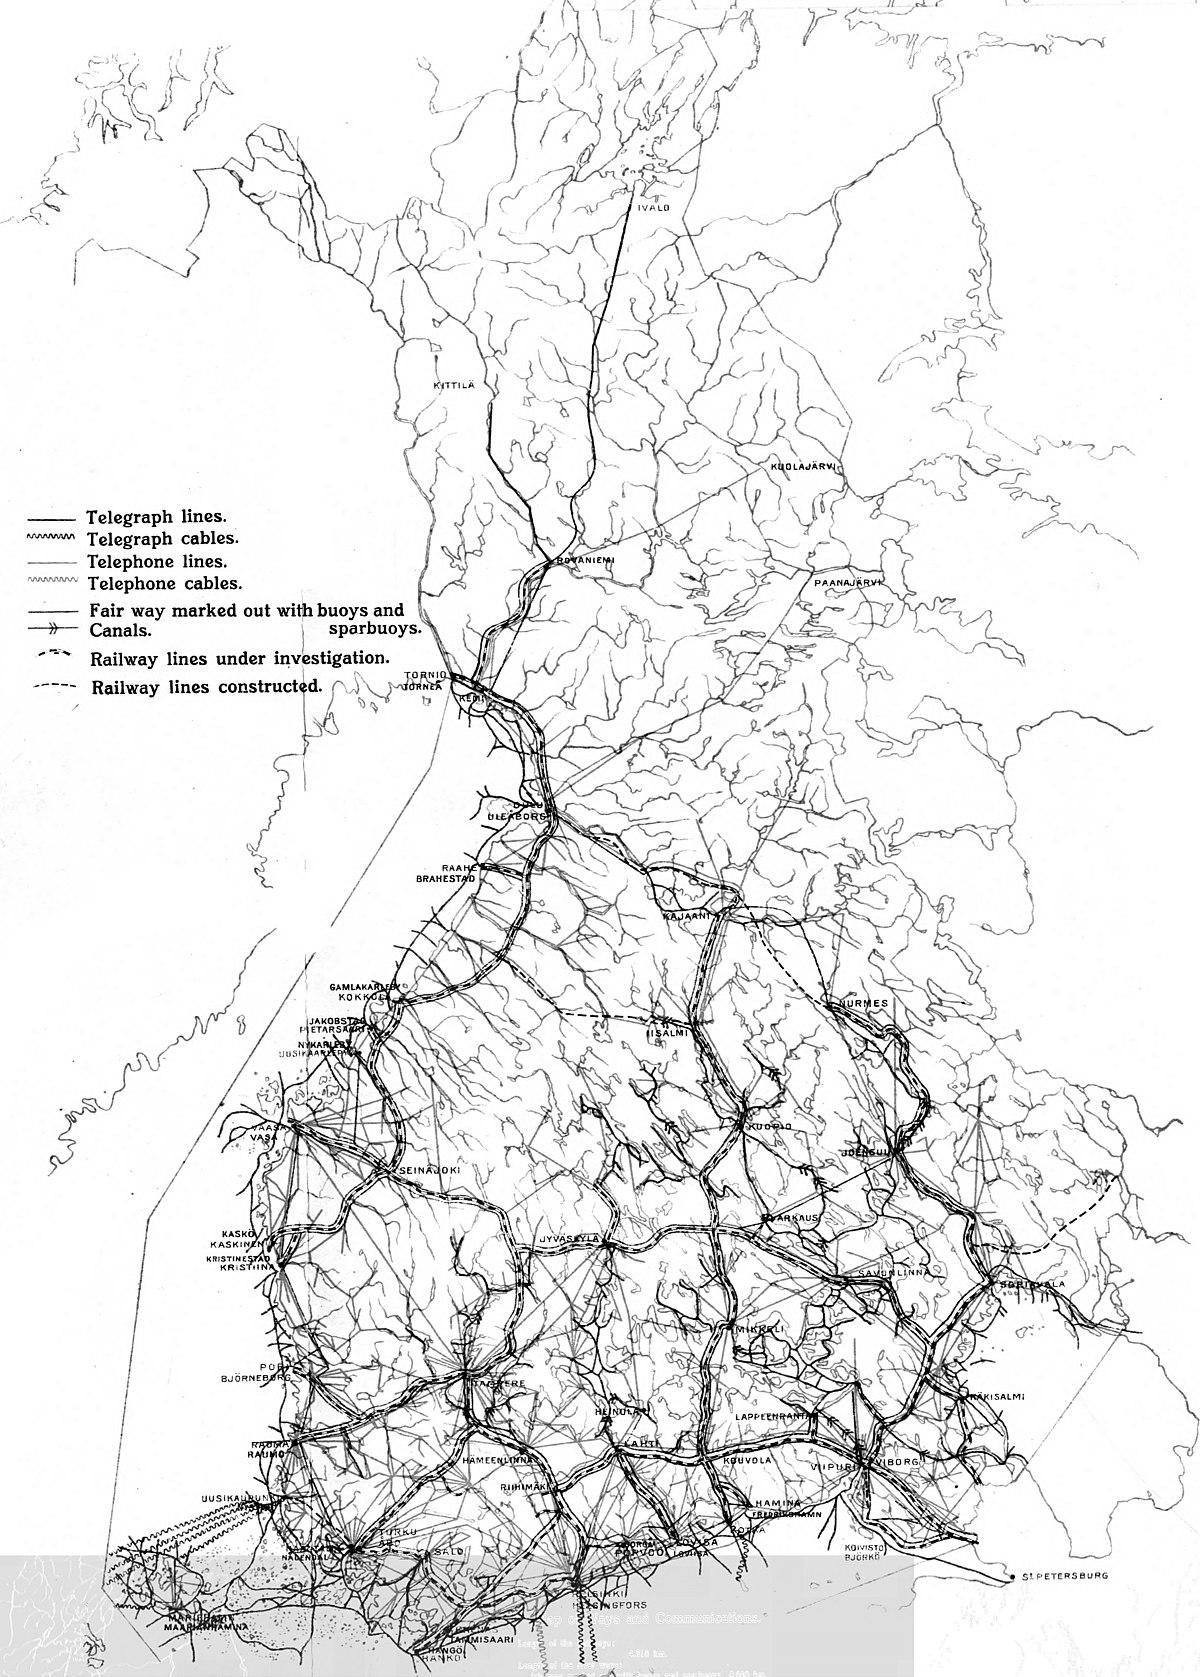 tele munications in finland wikipedia Telephone Cable Wiring tele munications in finland